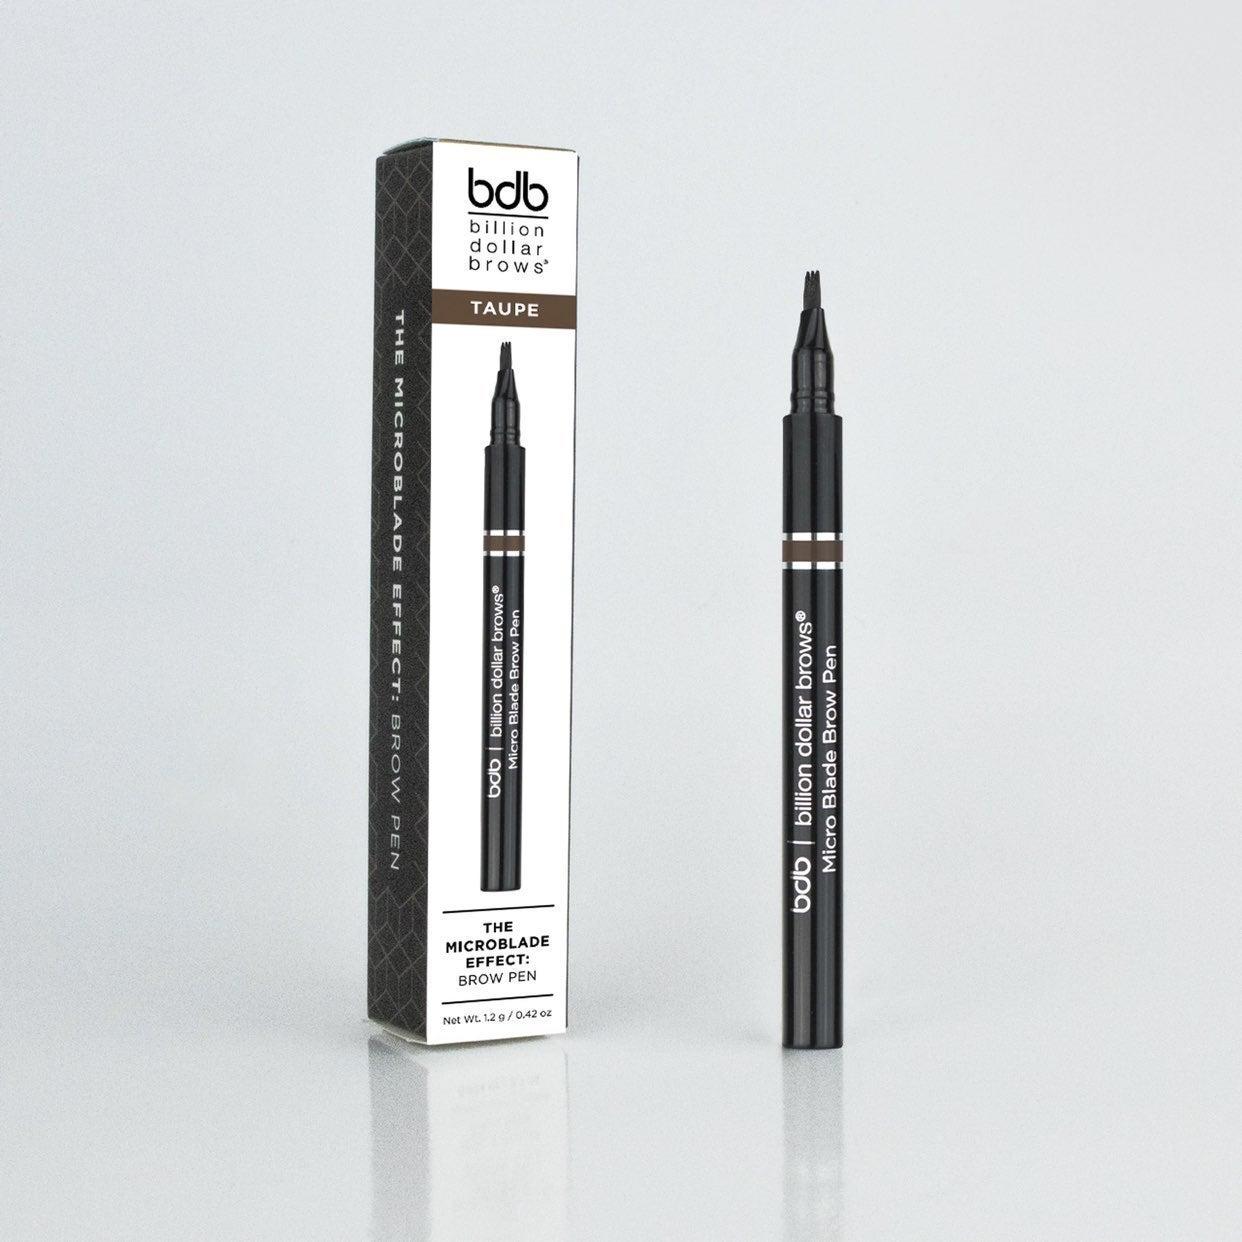 Billion dollar brow pen